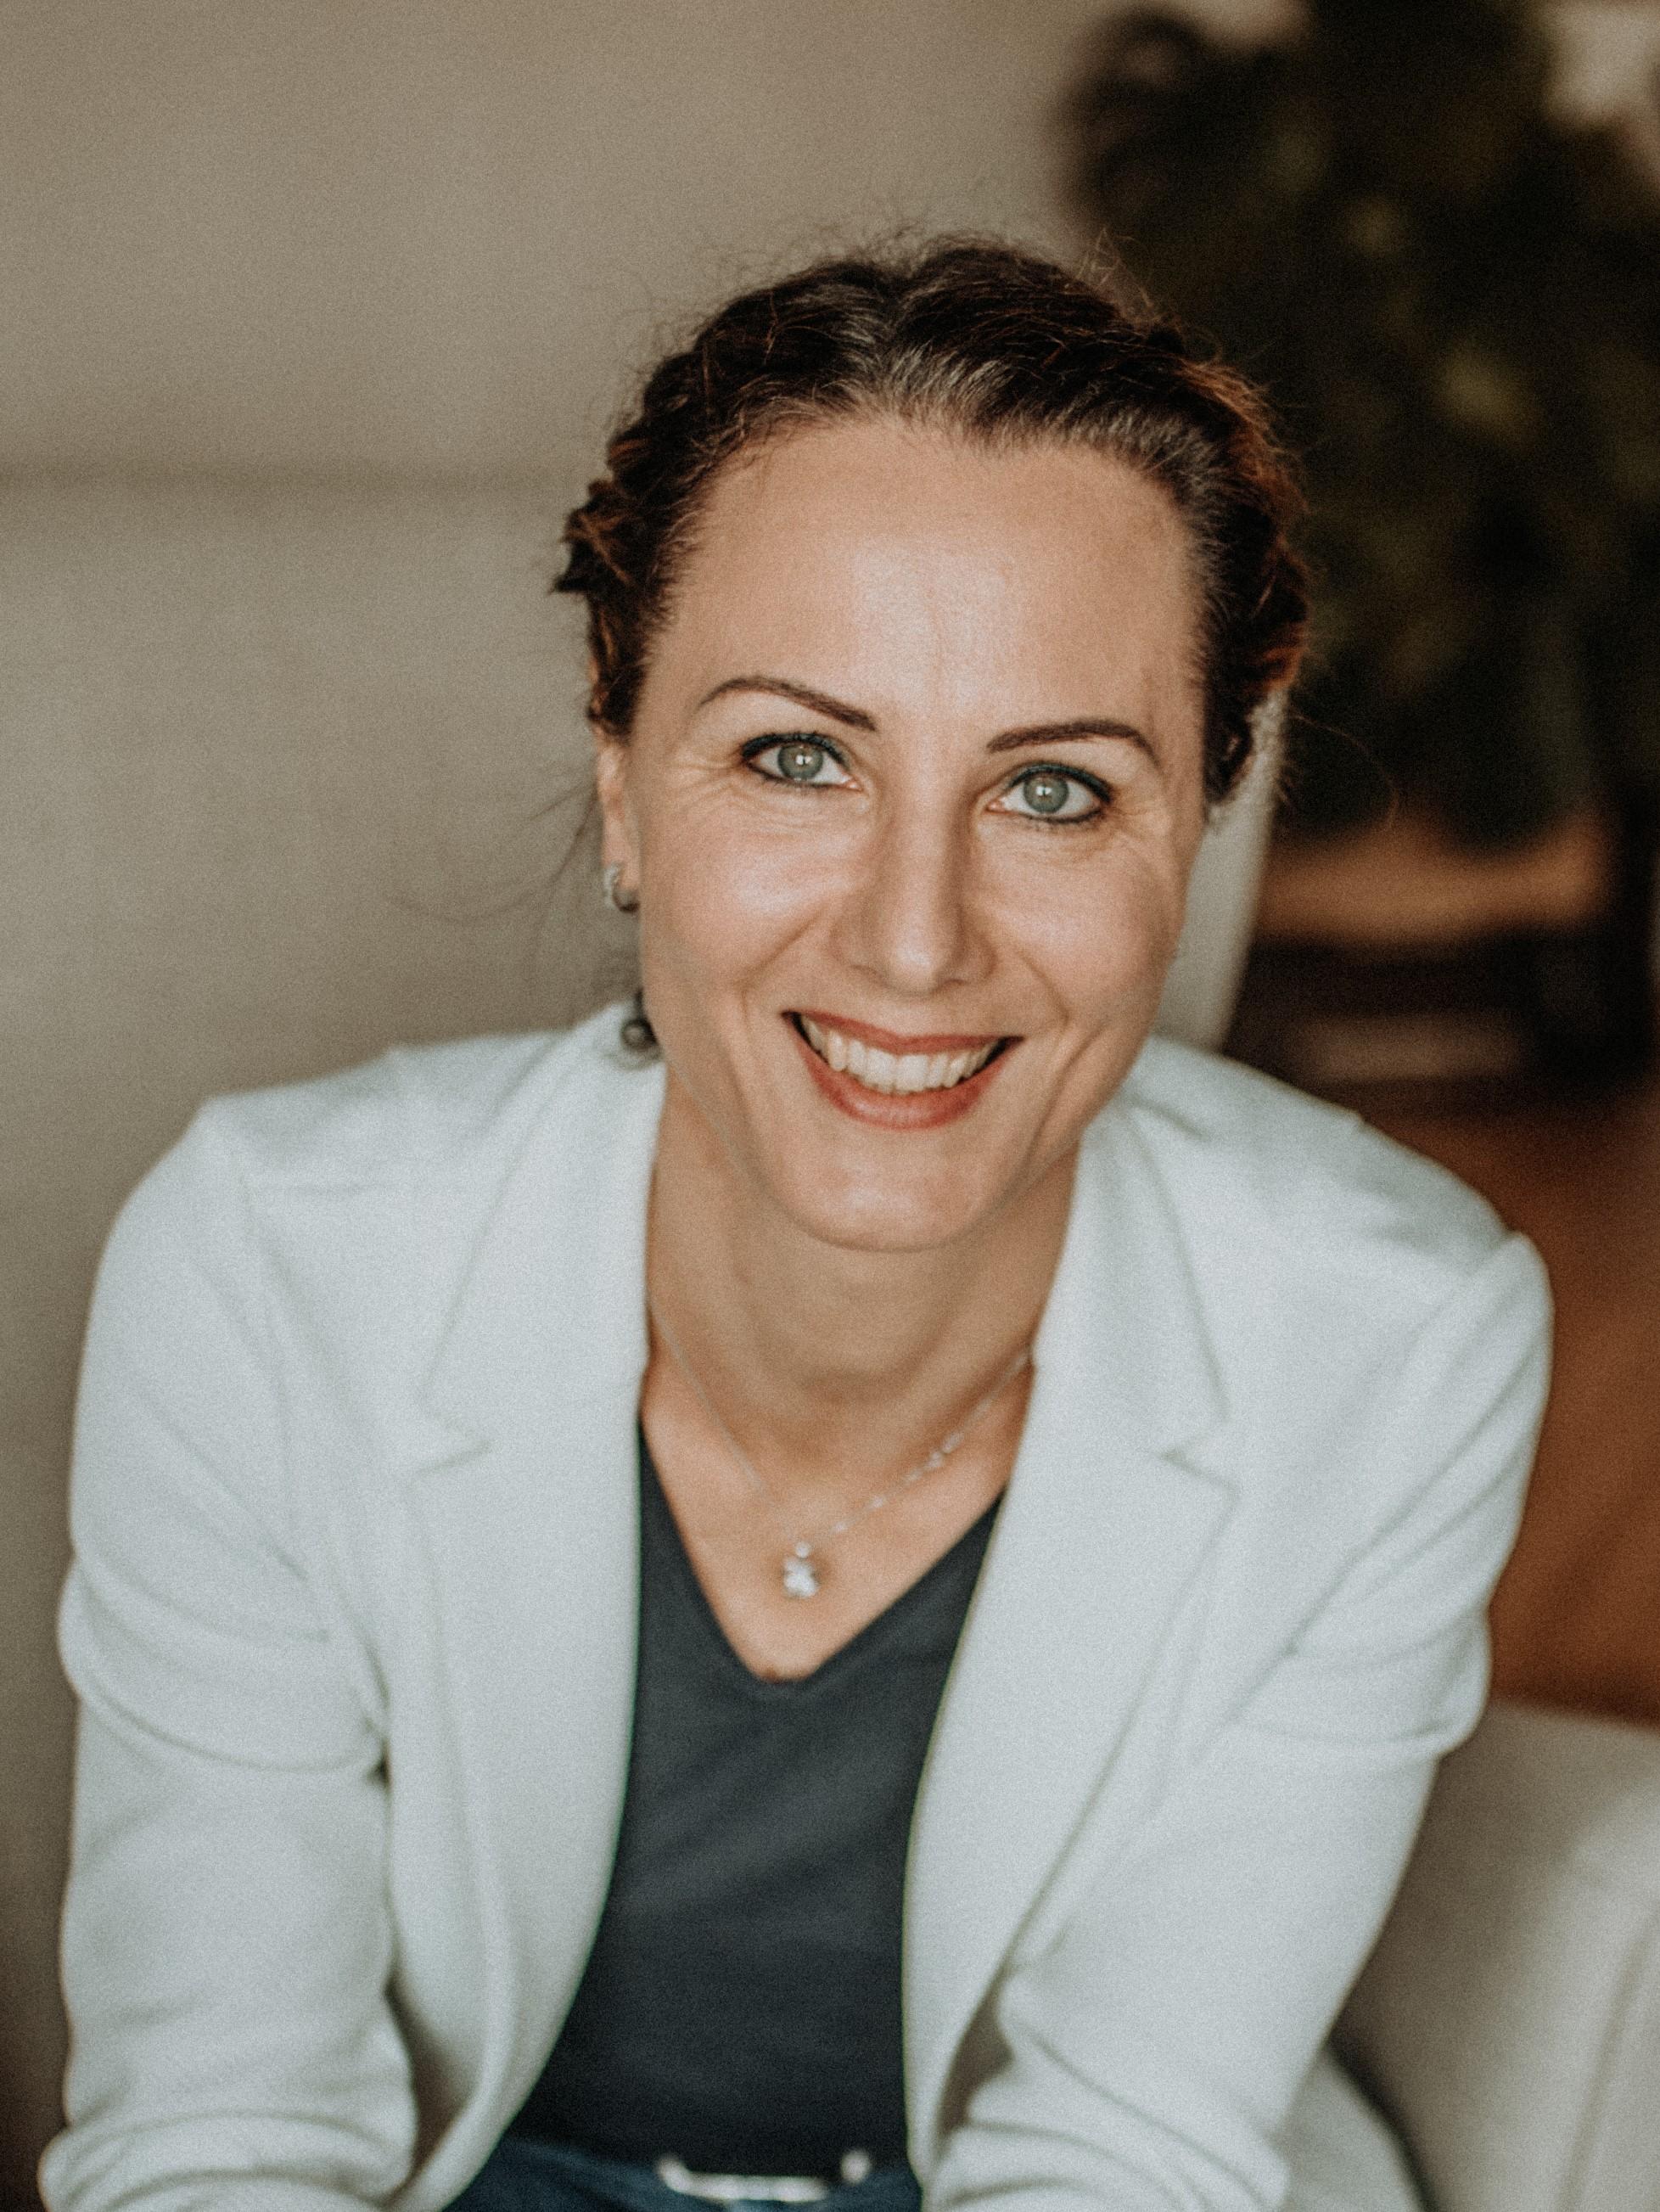 Martina Siebenhaar - Herzstahlen Akademie - Profilbild